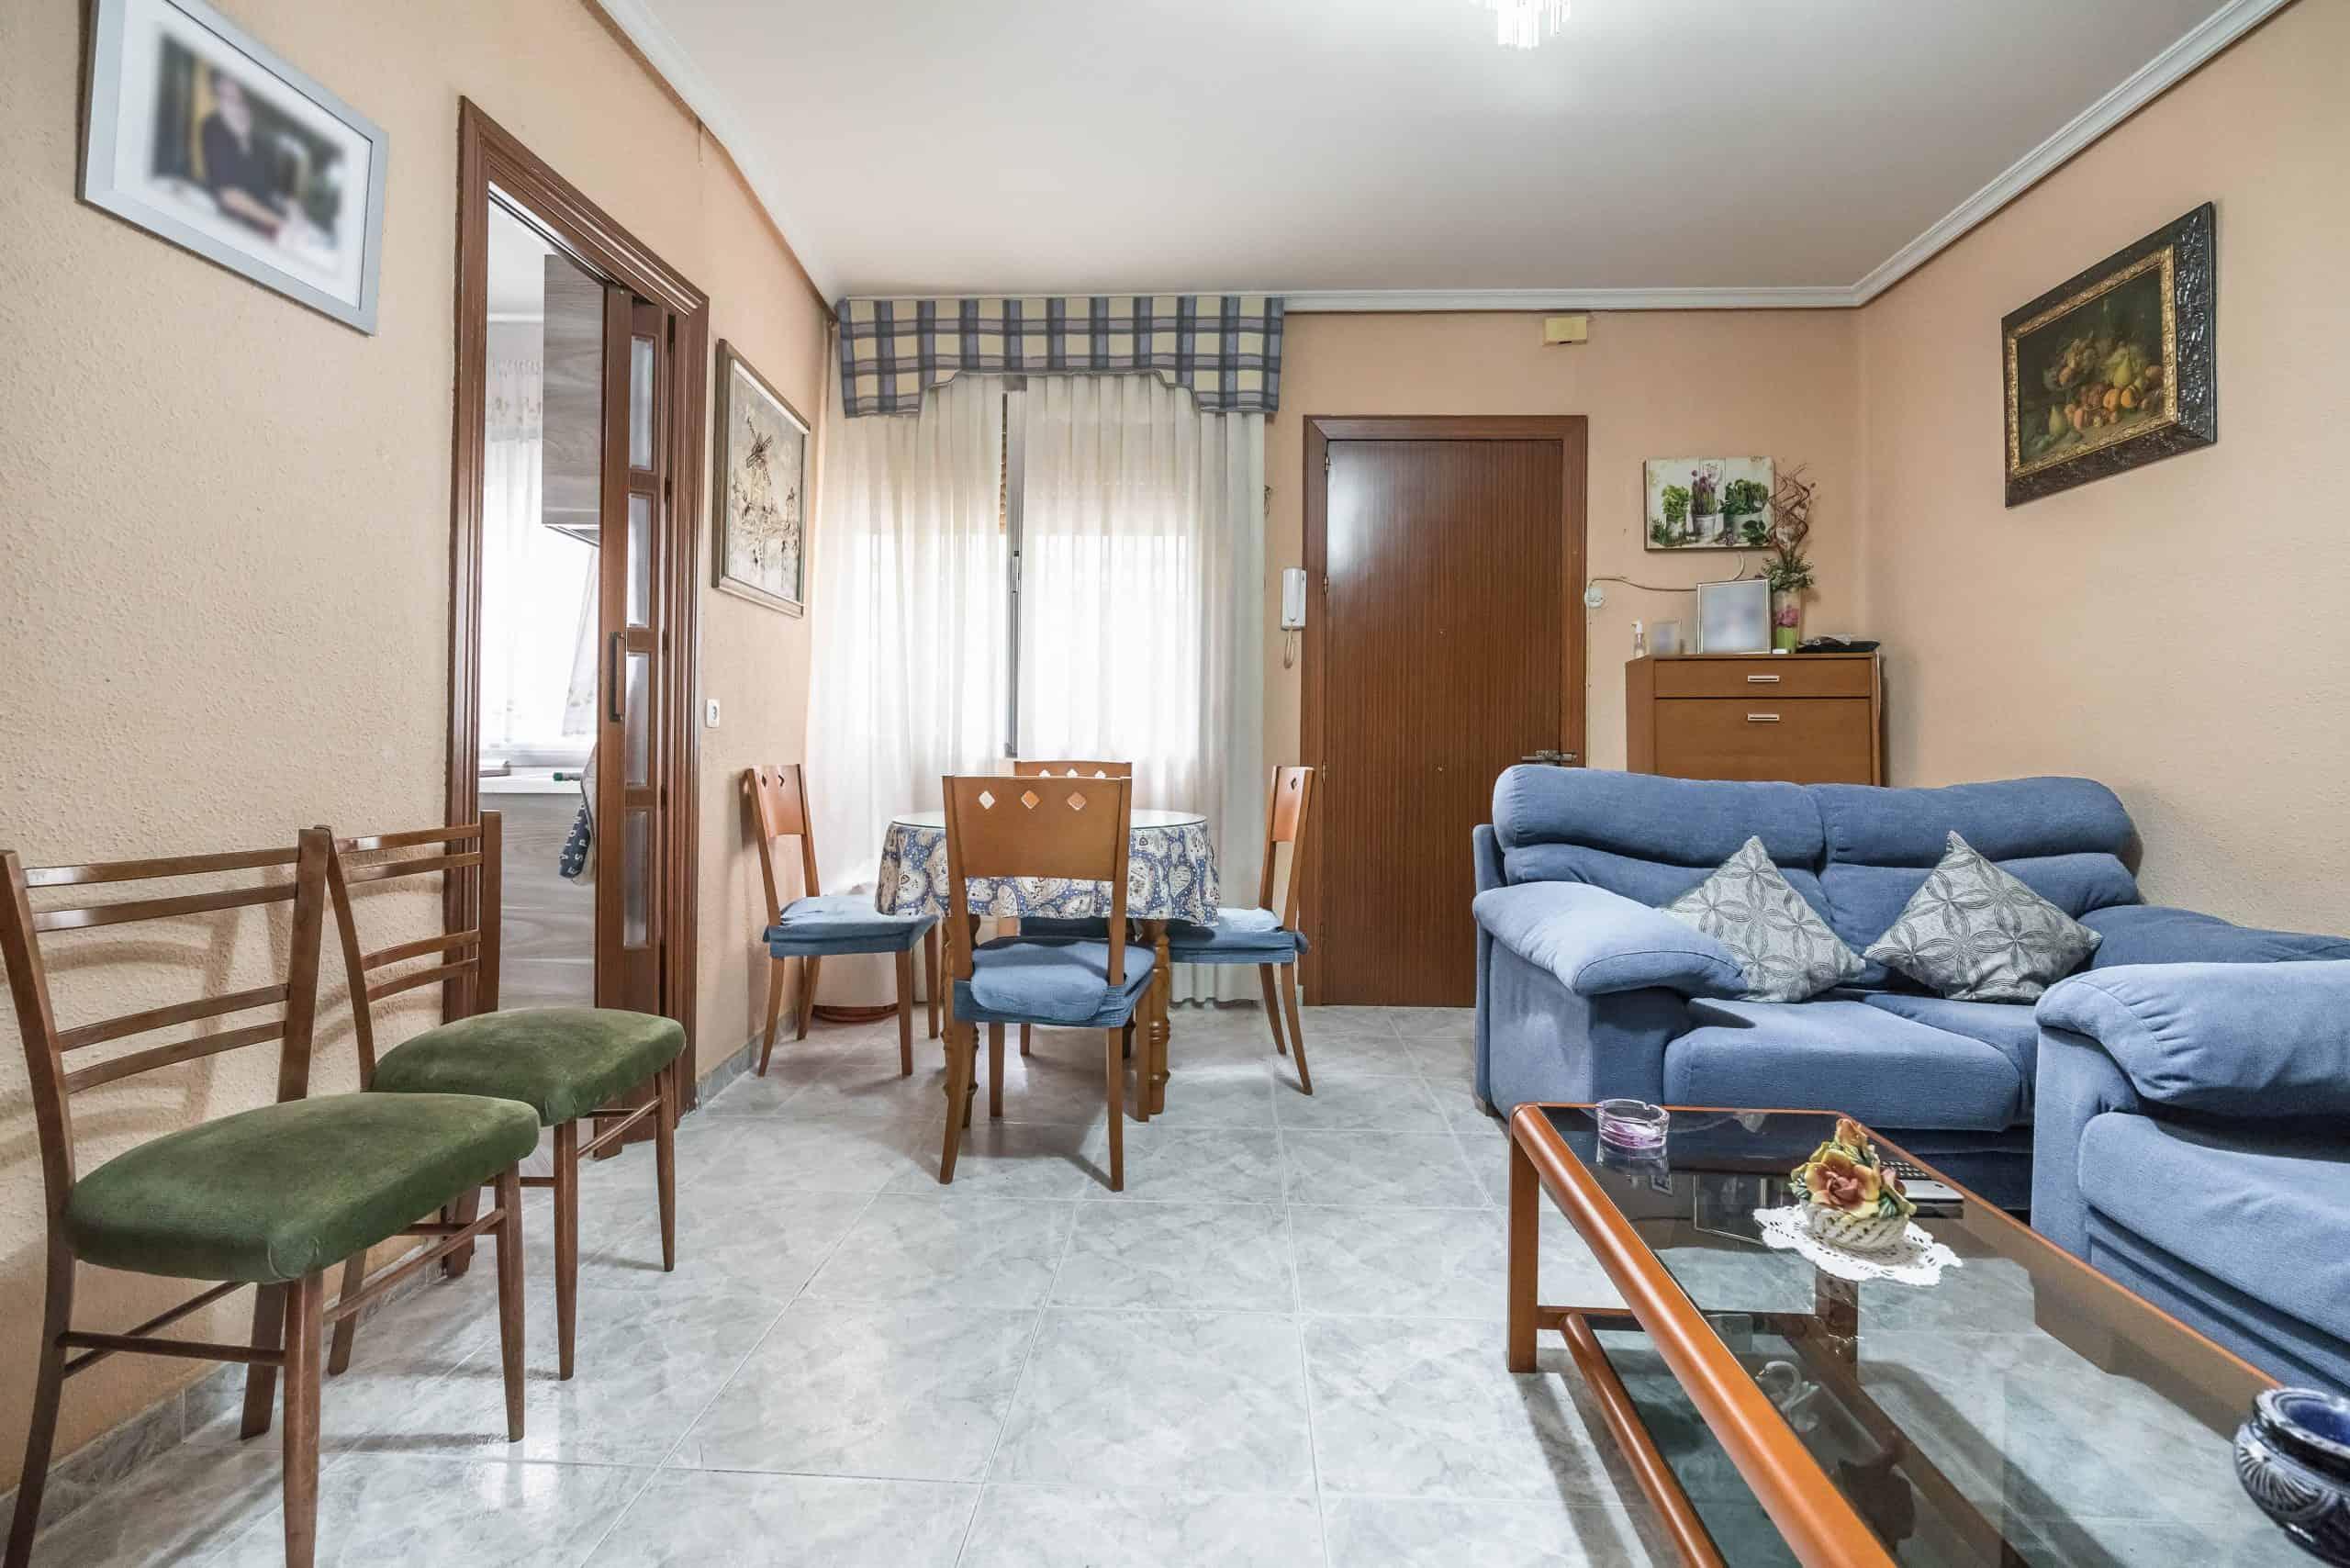 Agencia Inmobiliaria de Madrid-FUTUROCASA-Zona ARGANZUELA-EMBAJADORES-LEGAZPI1 SALON (2)